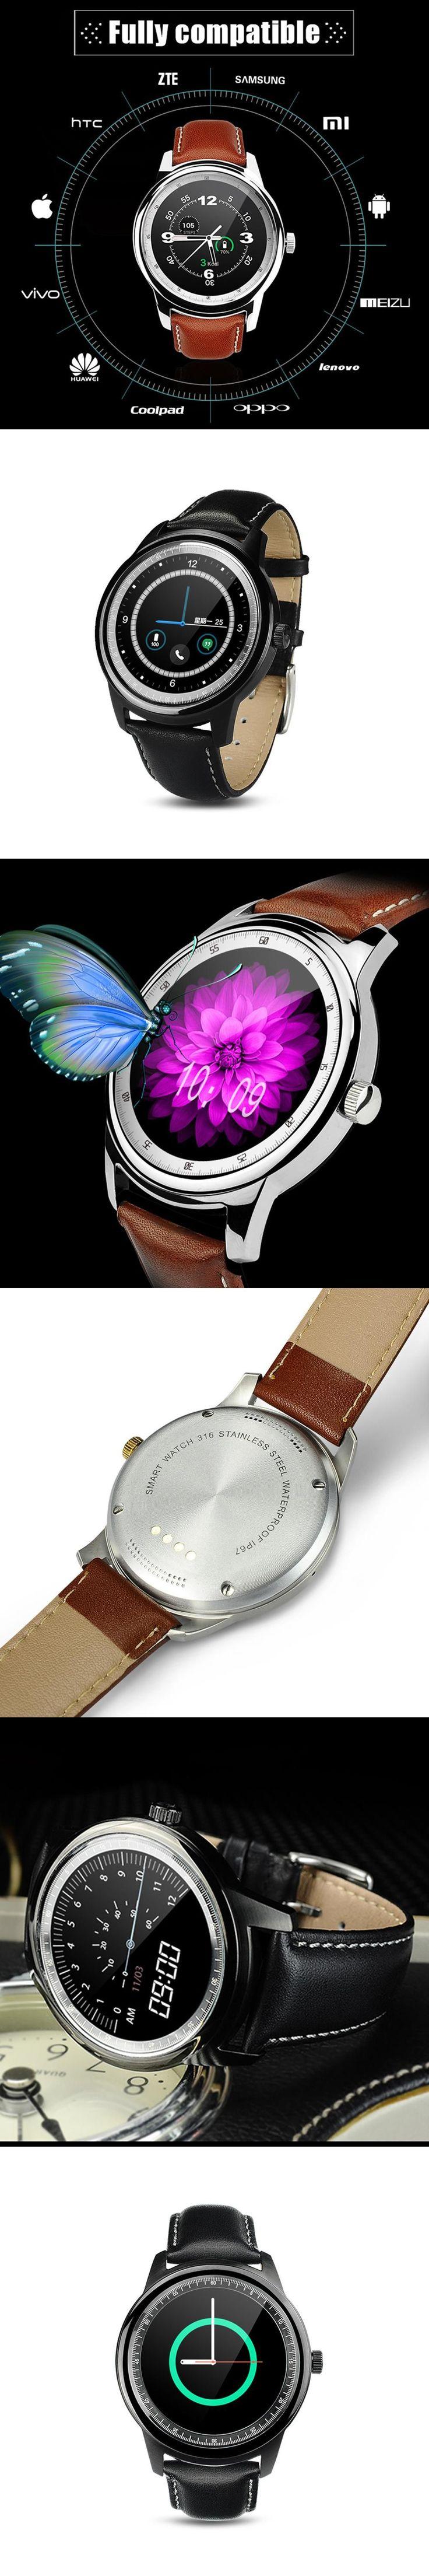 Full Touch Screen Smart Watch Wearable Devices for iPhone Huawei Xiaomi Meizu Sony Samsung Fitness Tracker #smartwatch Wristwatch